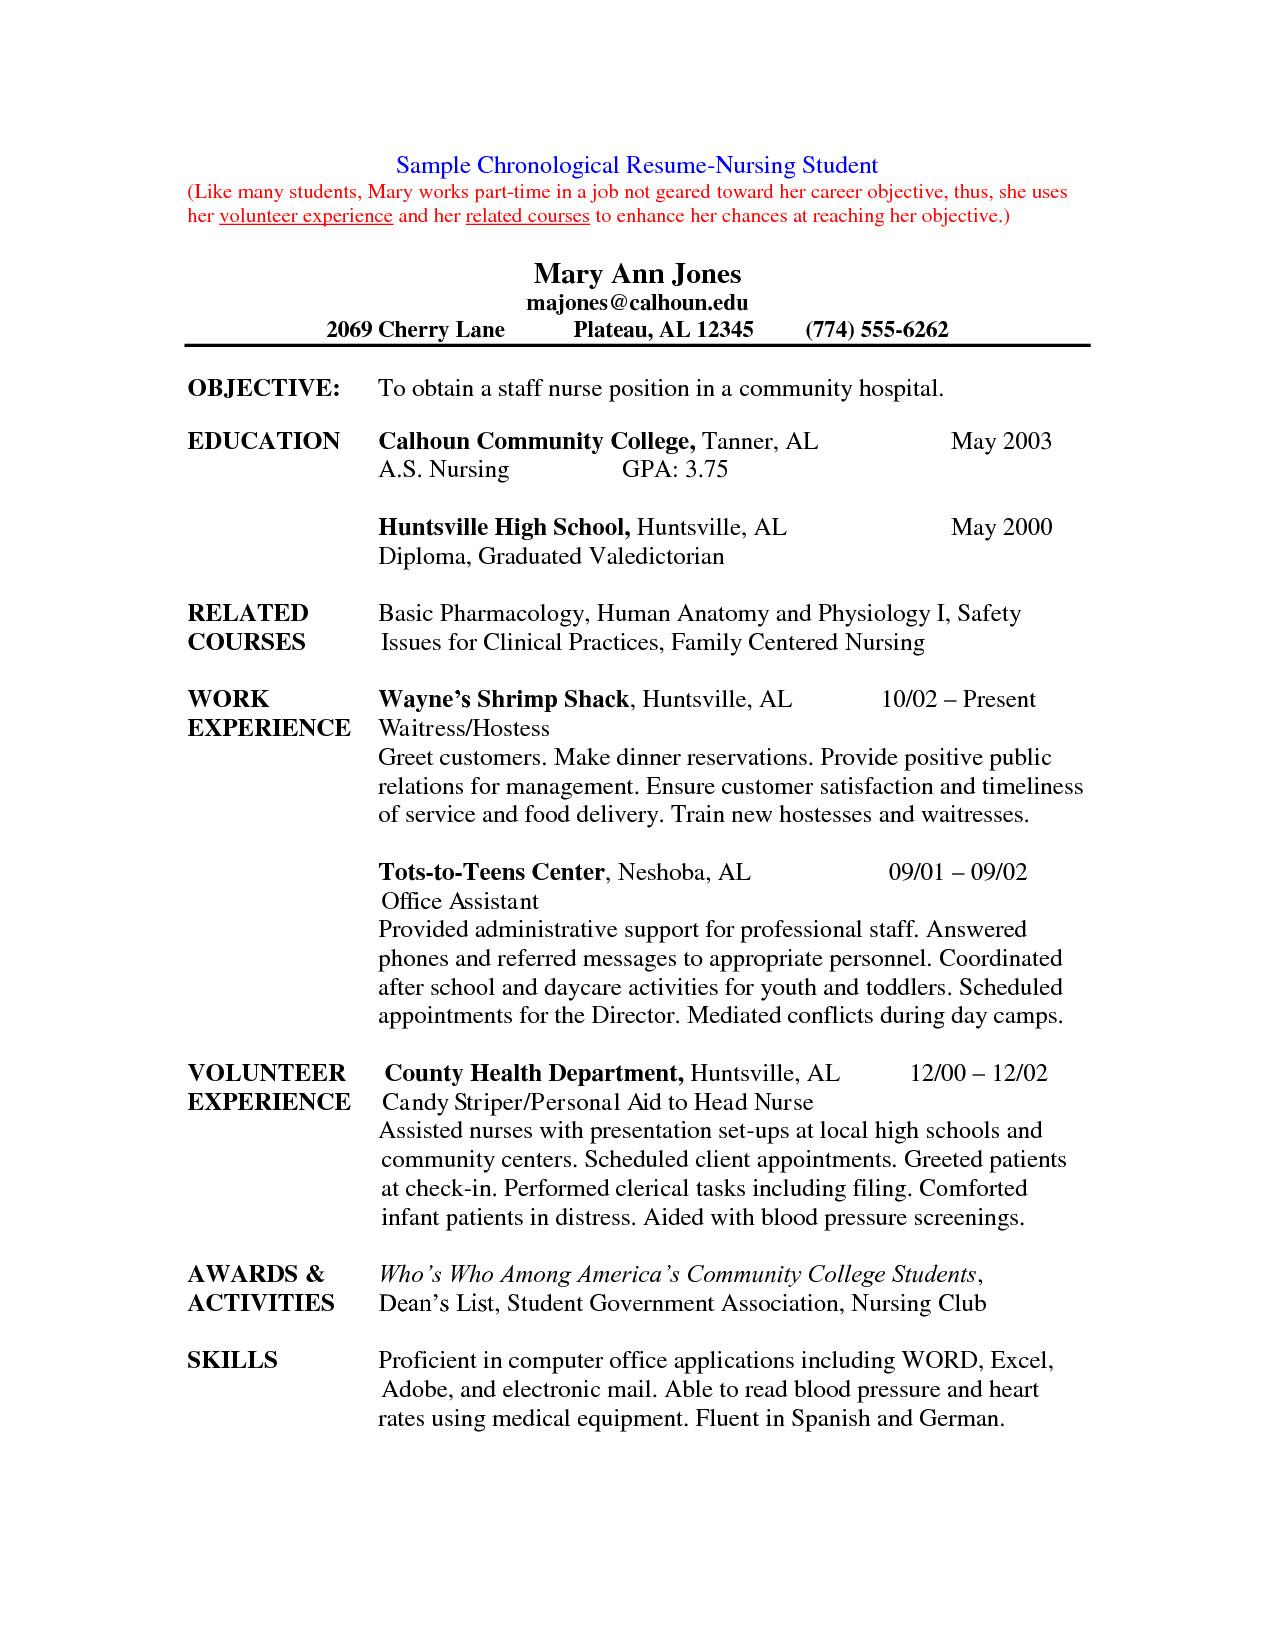 Nursing Student Resume Templates Cover Letters for Nursing Job Application Pdf